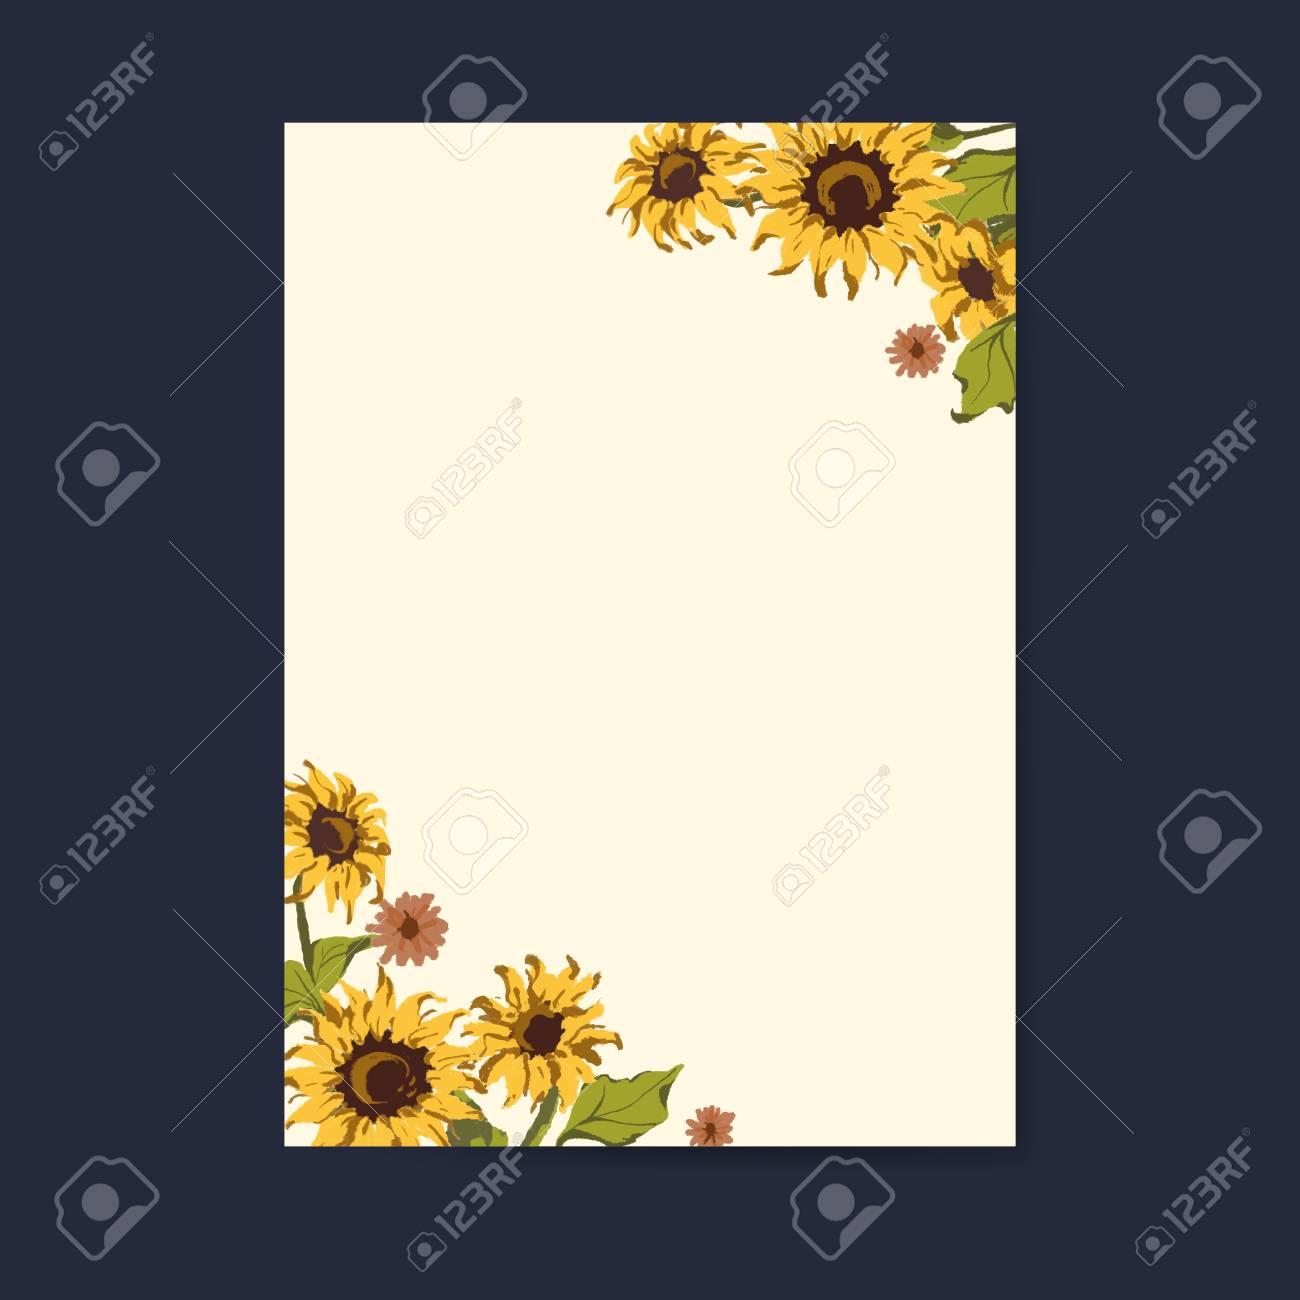 Blank Sunflower Invitation Card Mockup Vector